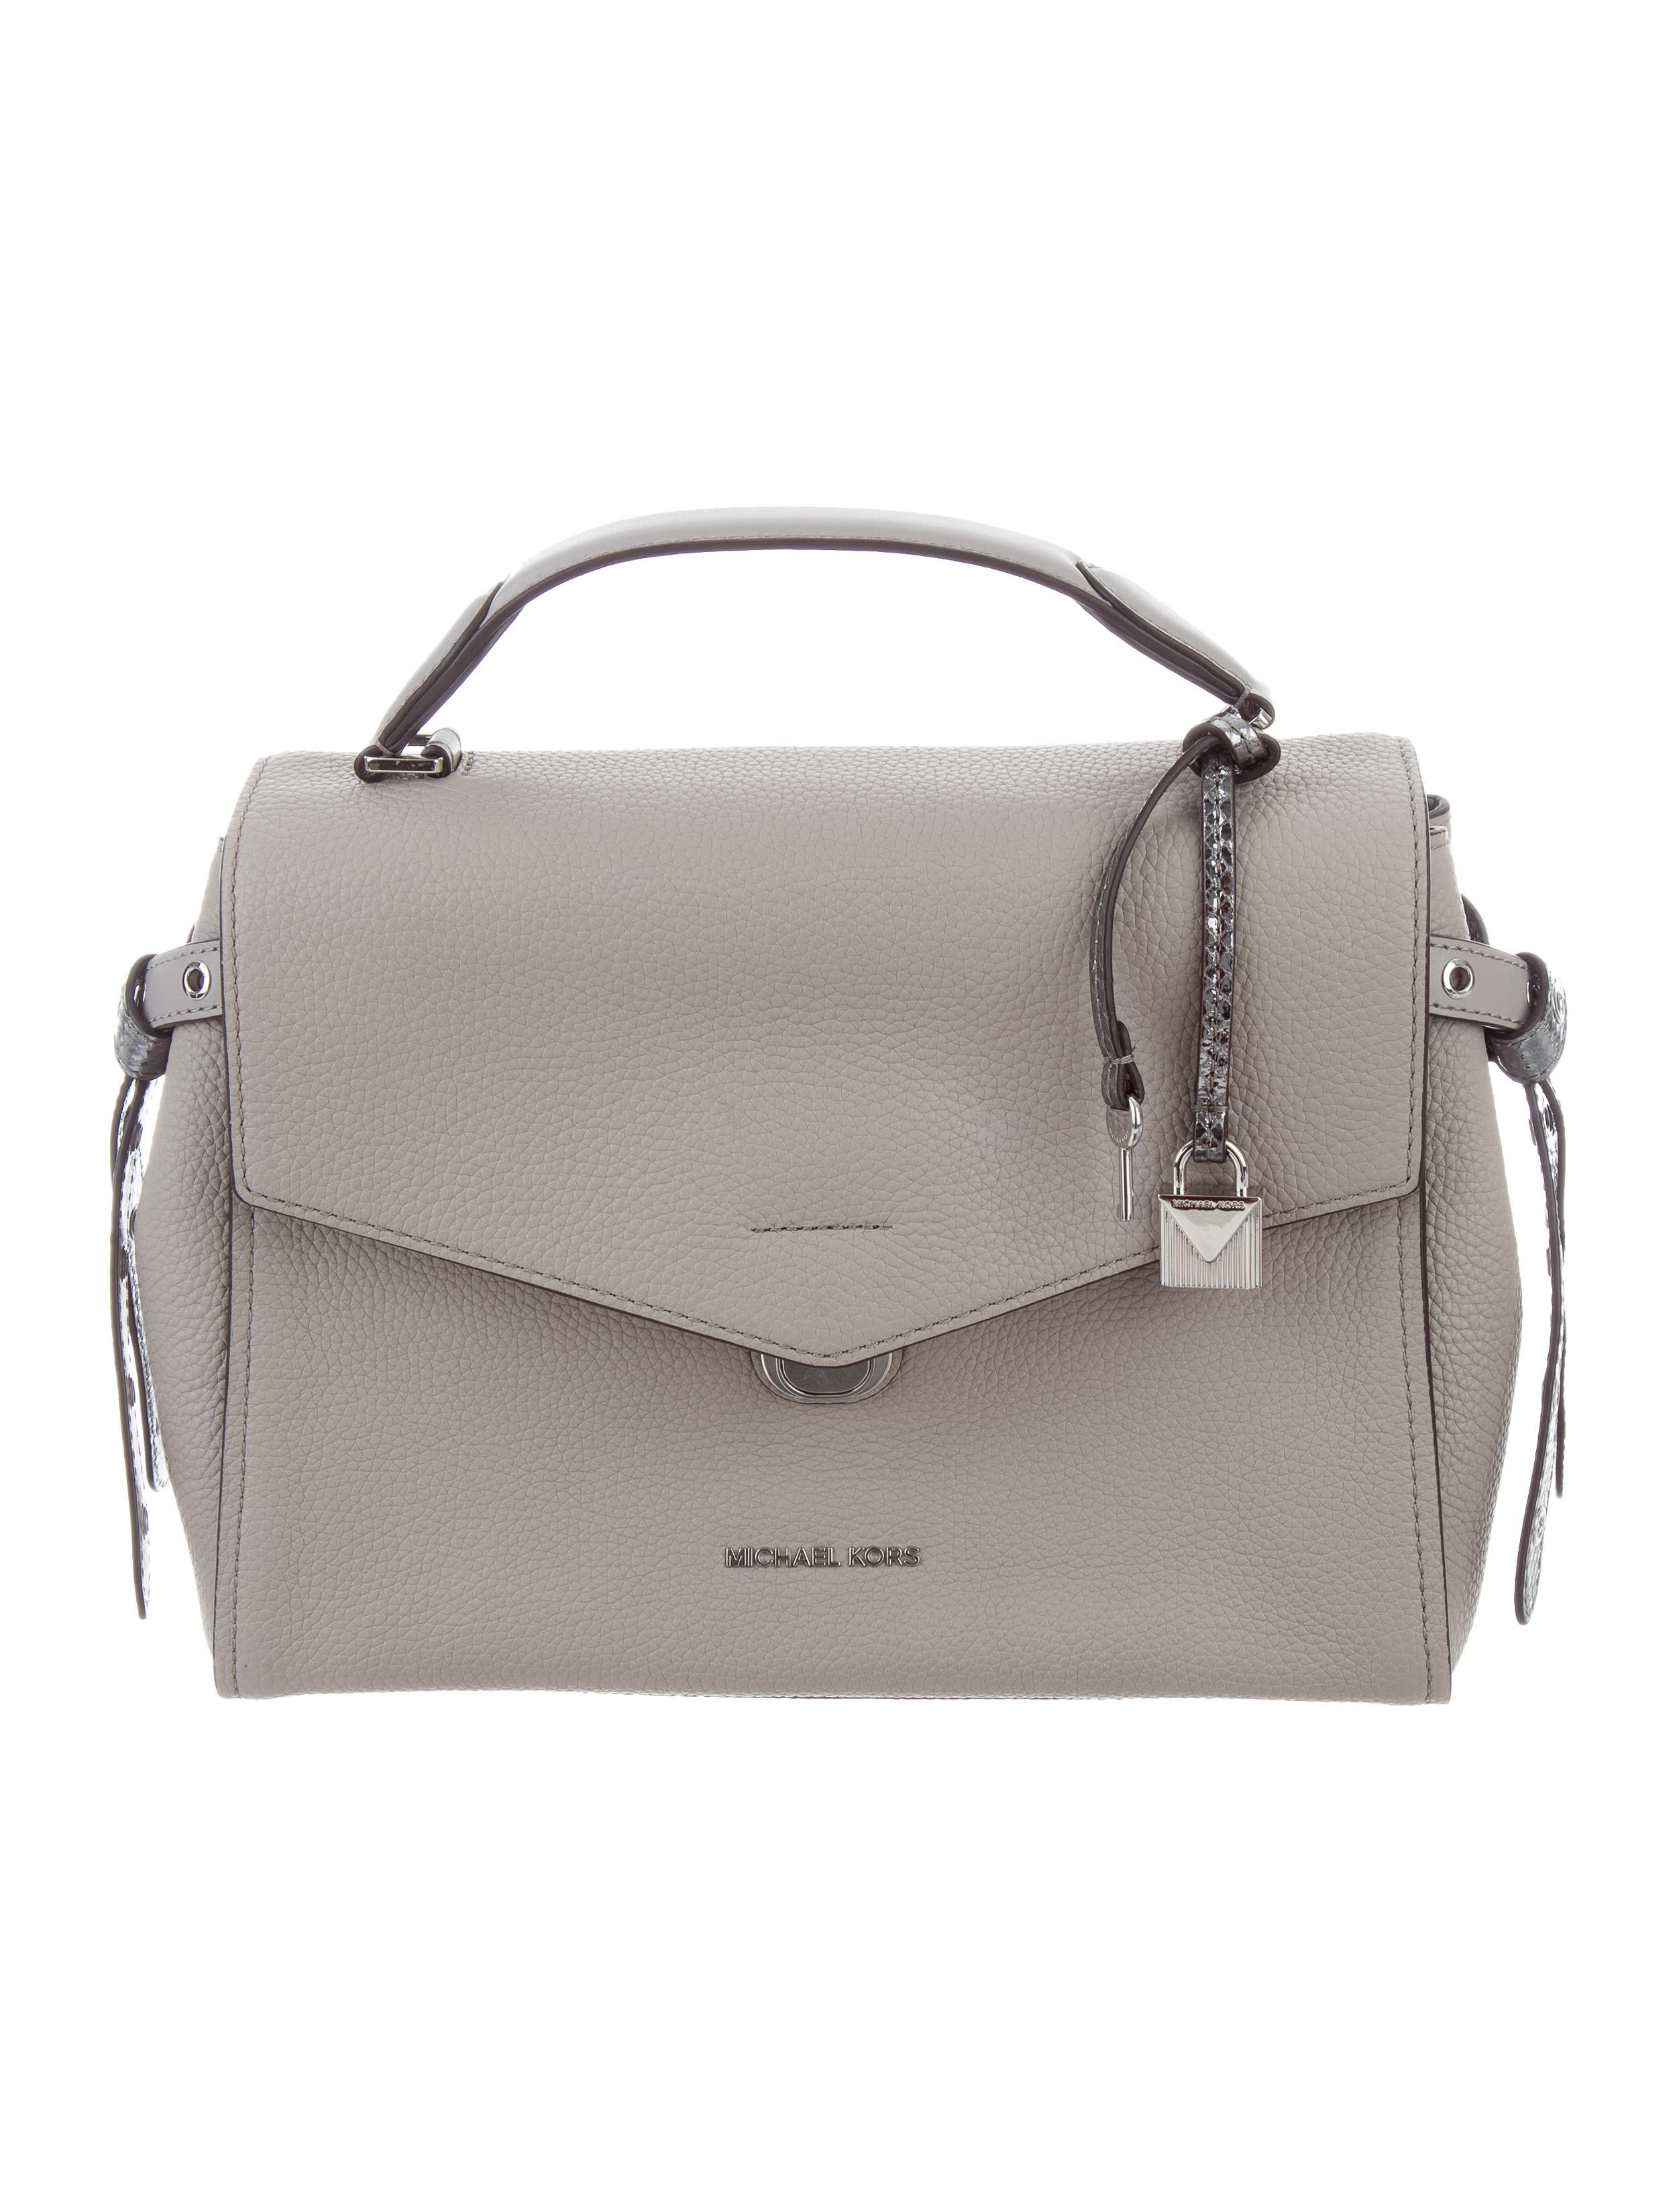 2b6c6bb2b8610 Michael Michael Kors Medium Bristol Satchel w  Tags - Handbags ...